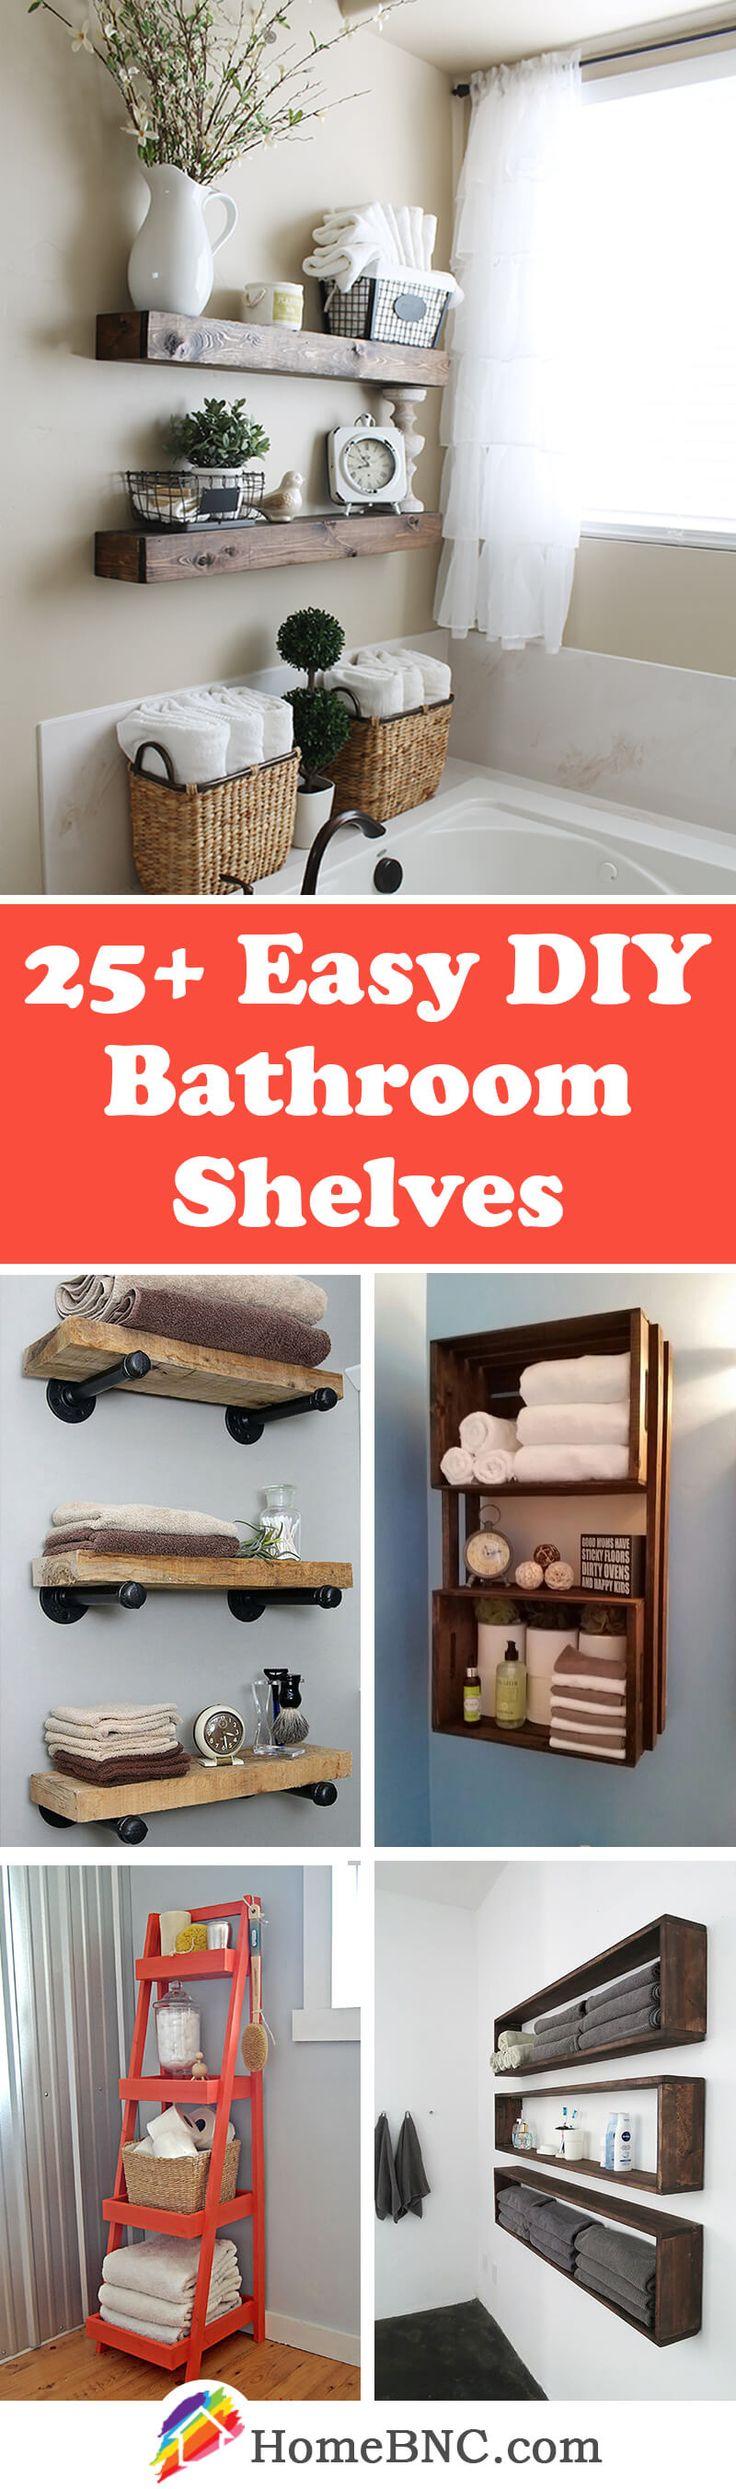 DIY Bathroom Shelf Decor Ideas